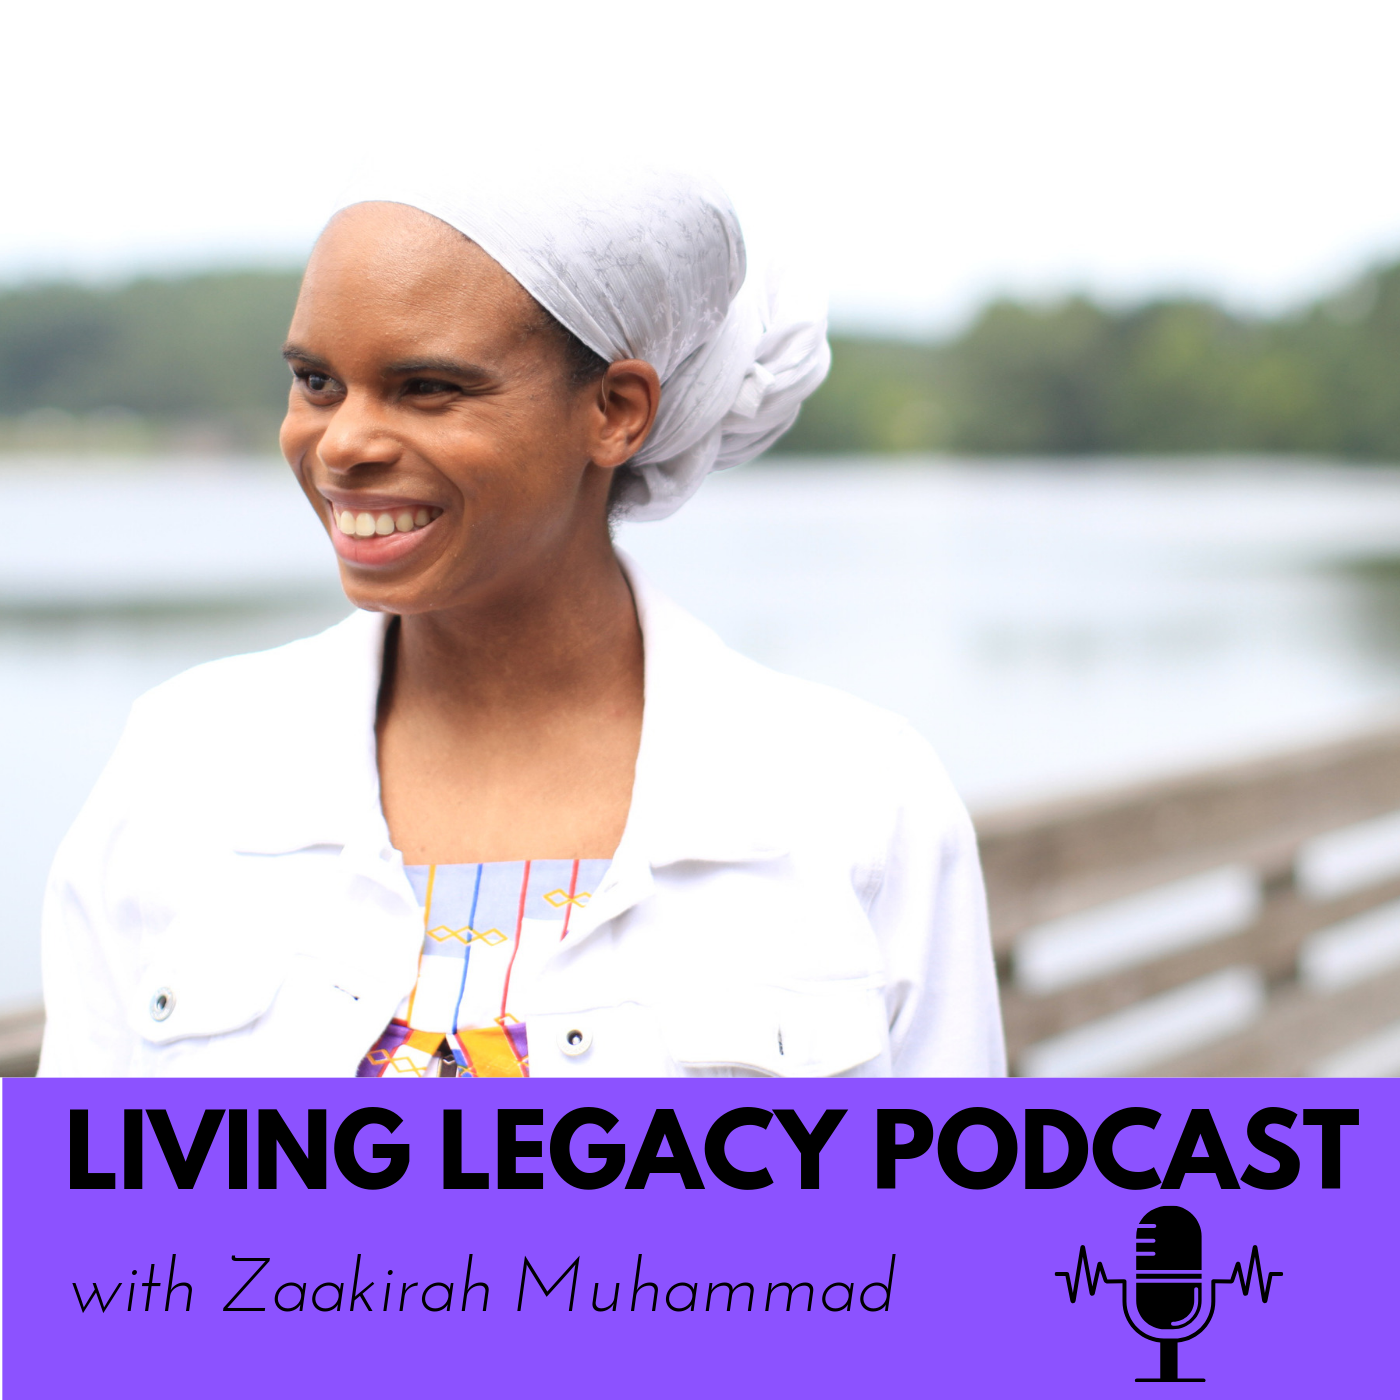 Living Legacy Podcast show art